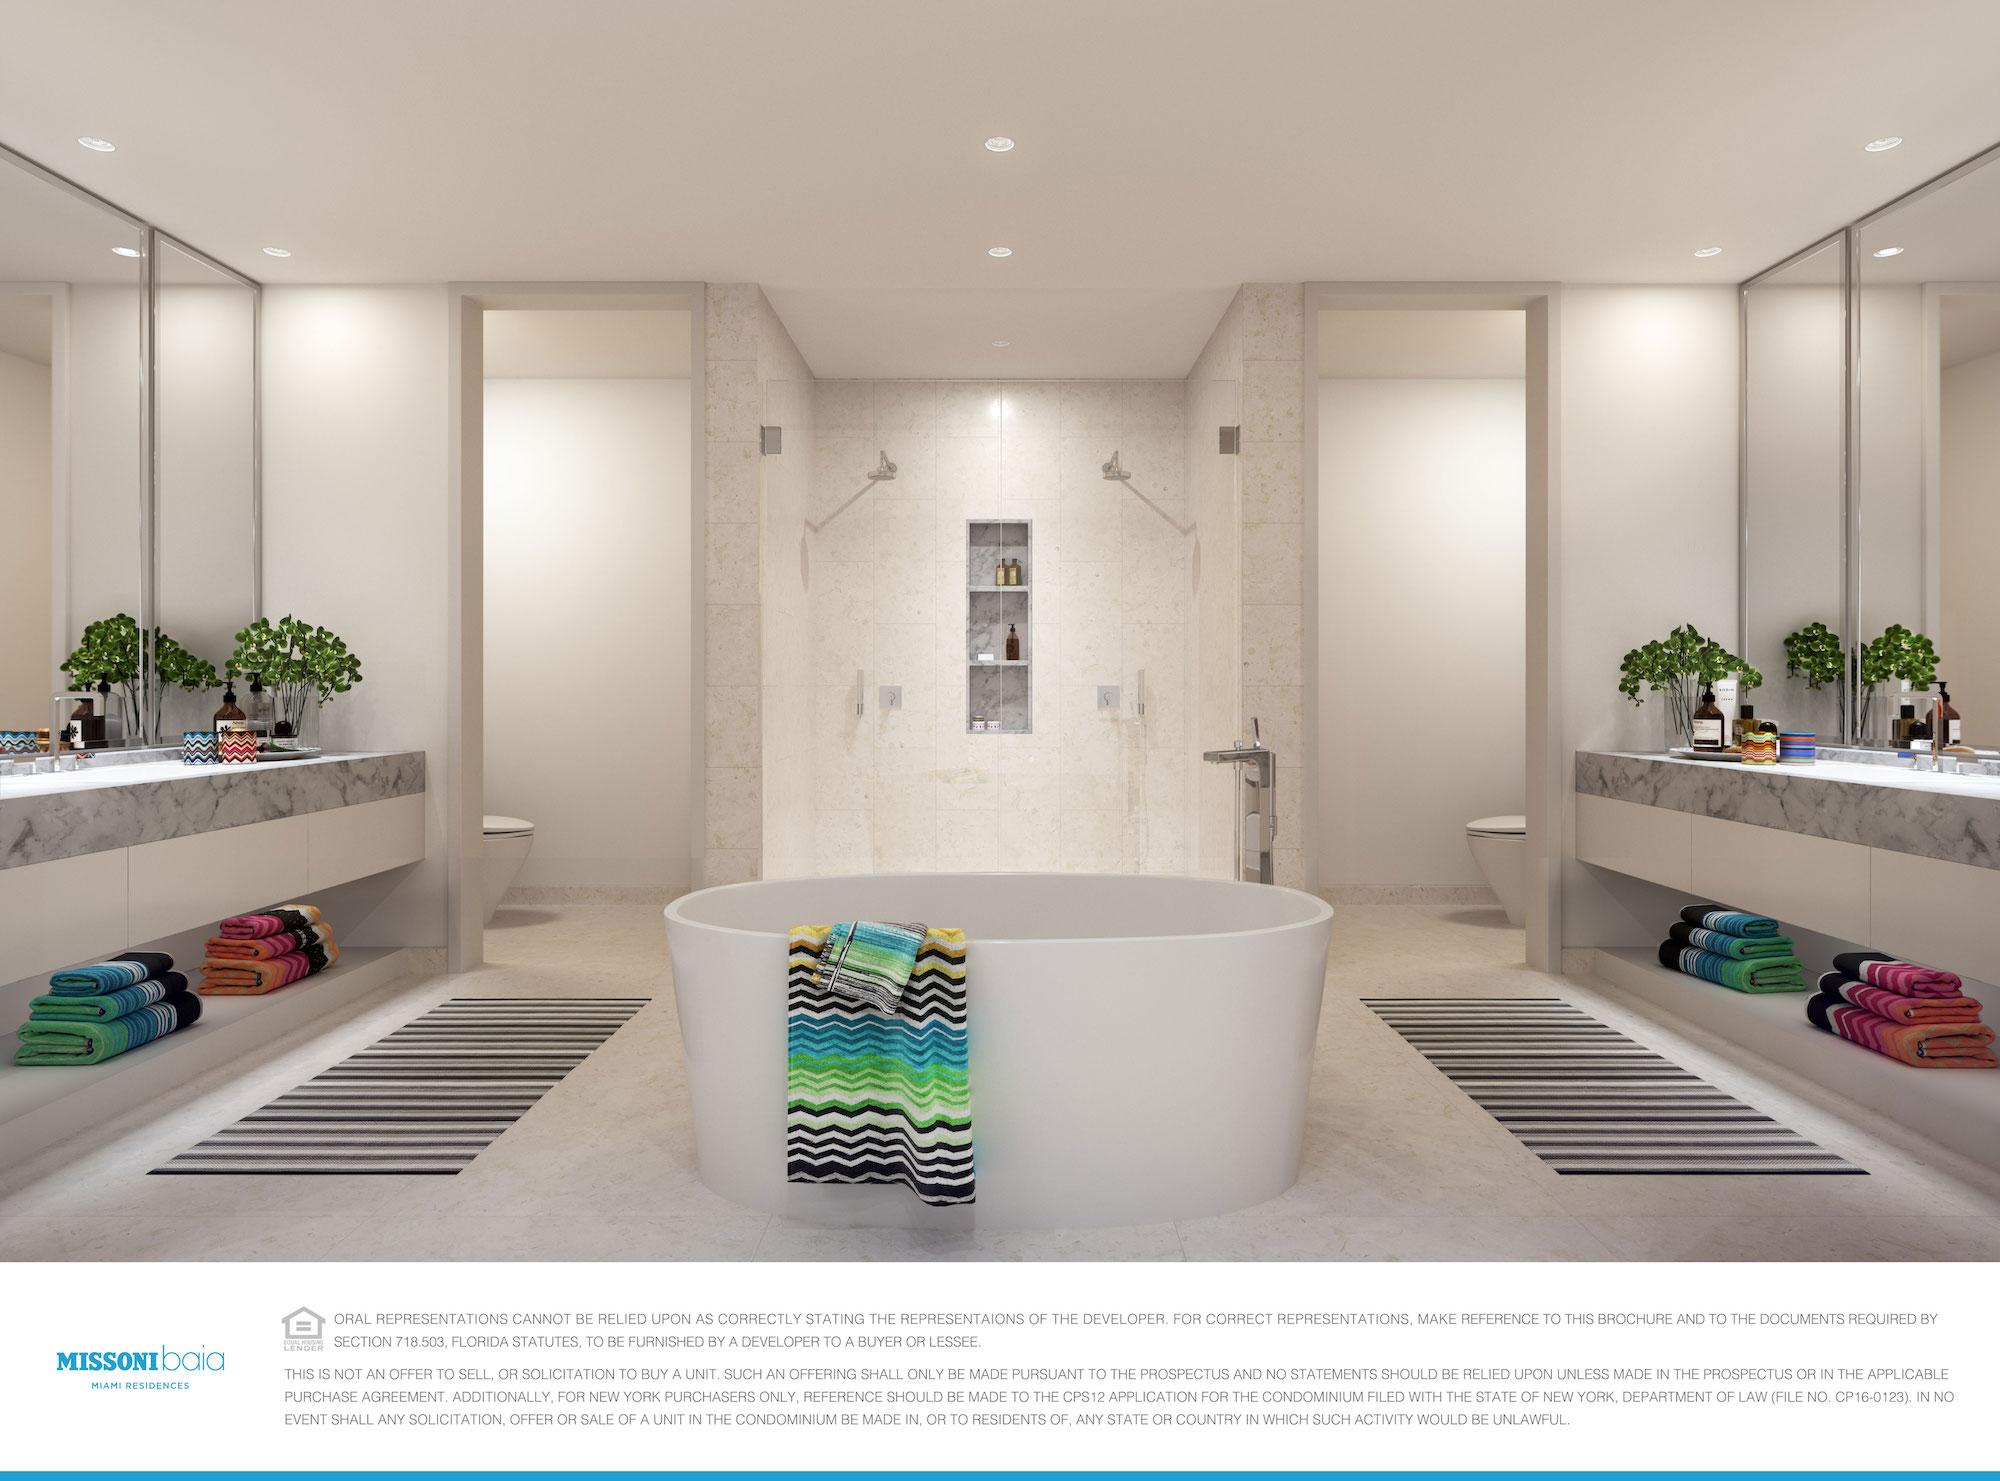 Missoni Baia Bathroom